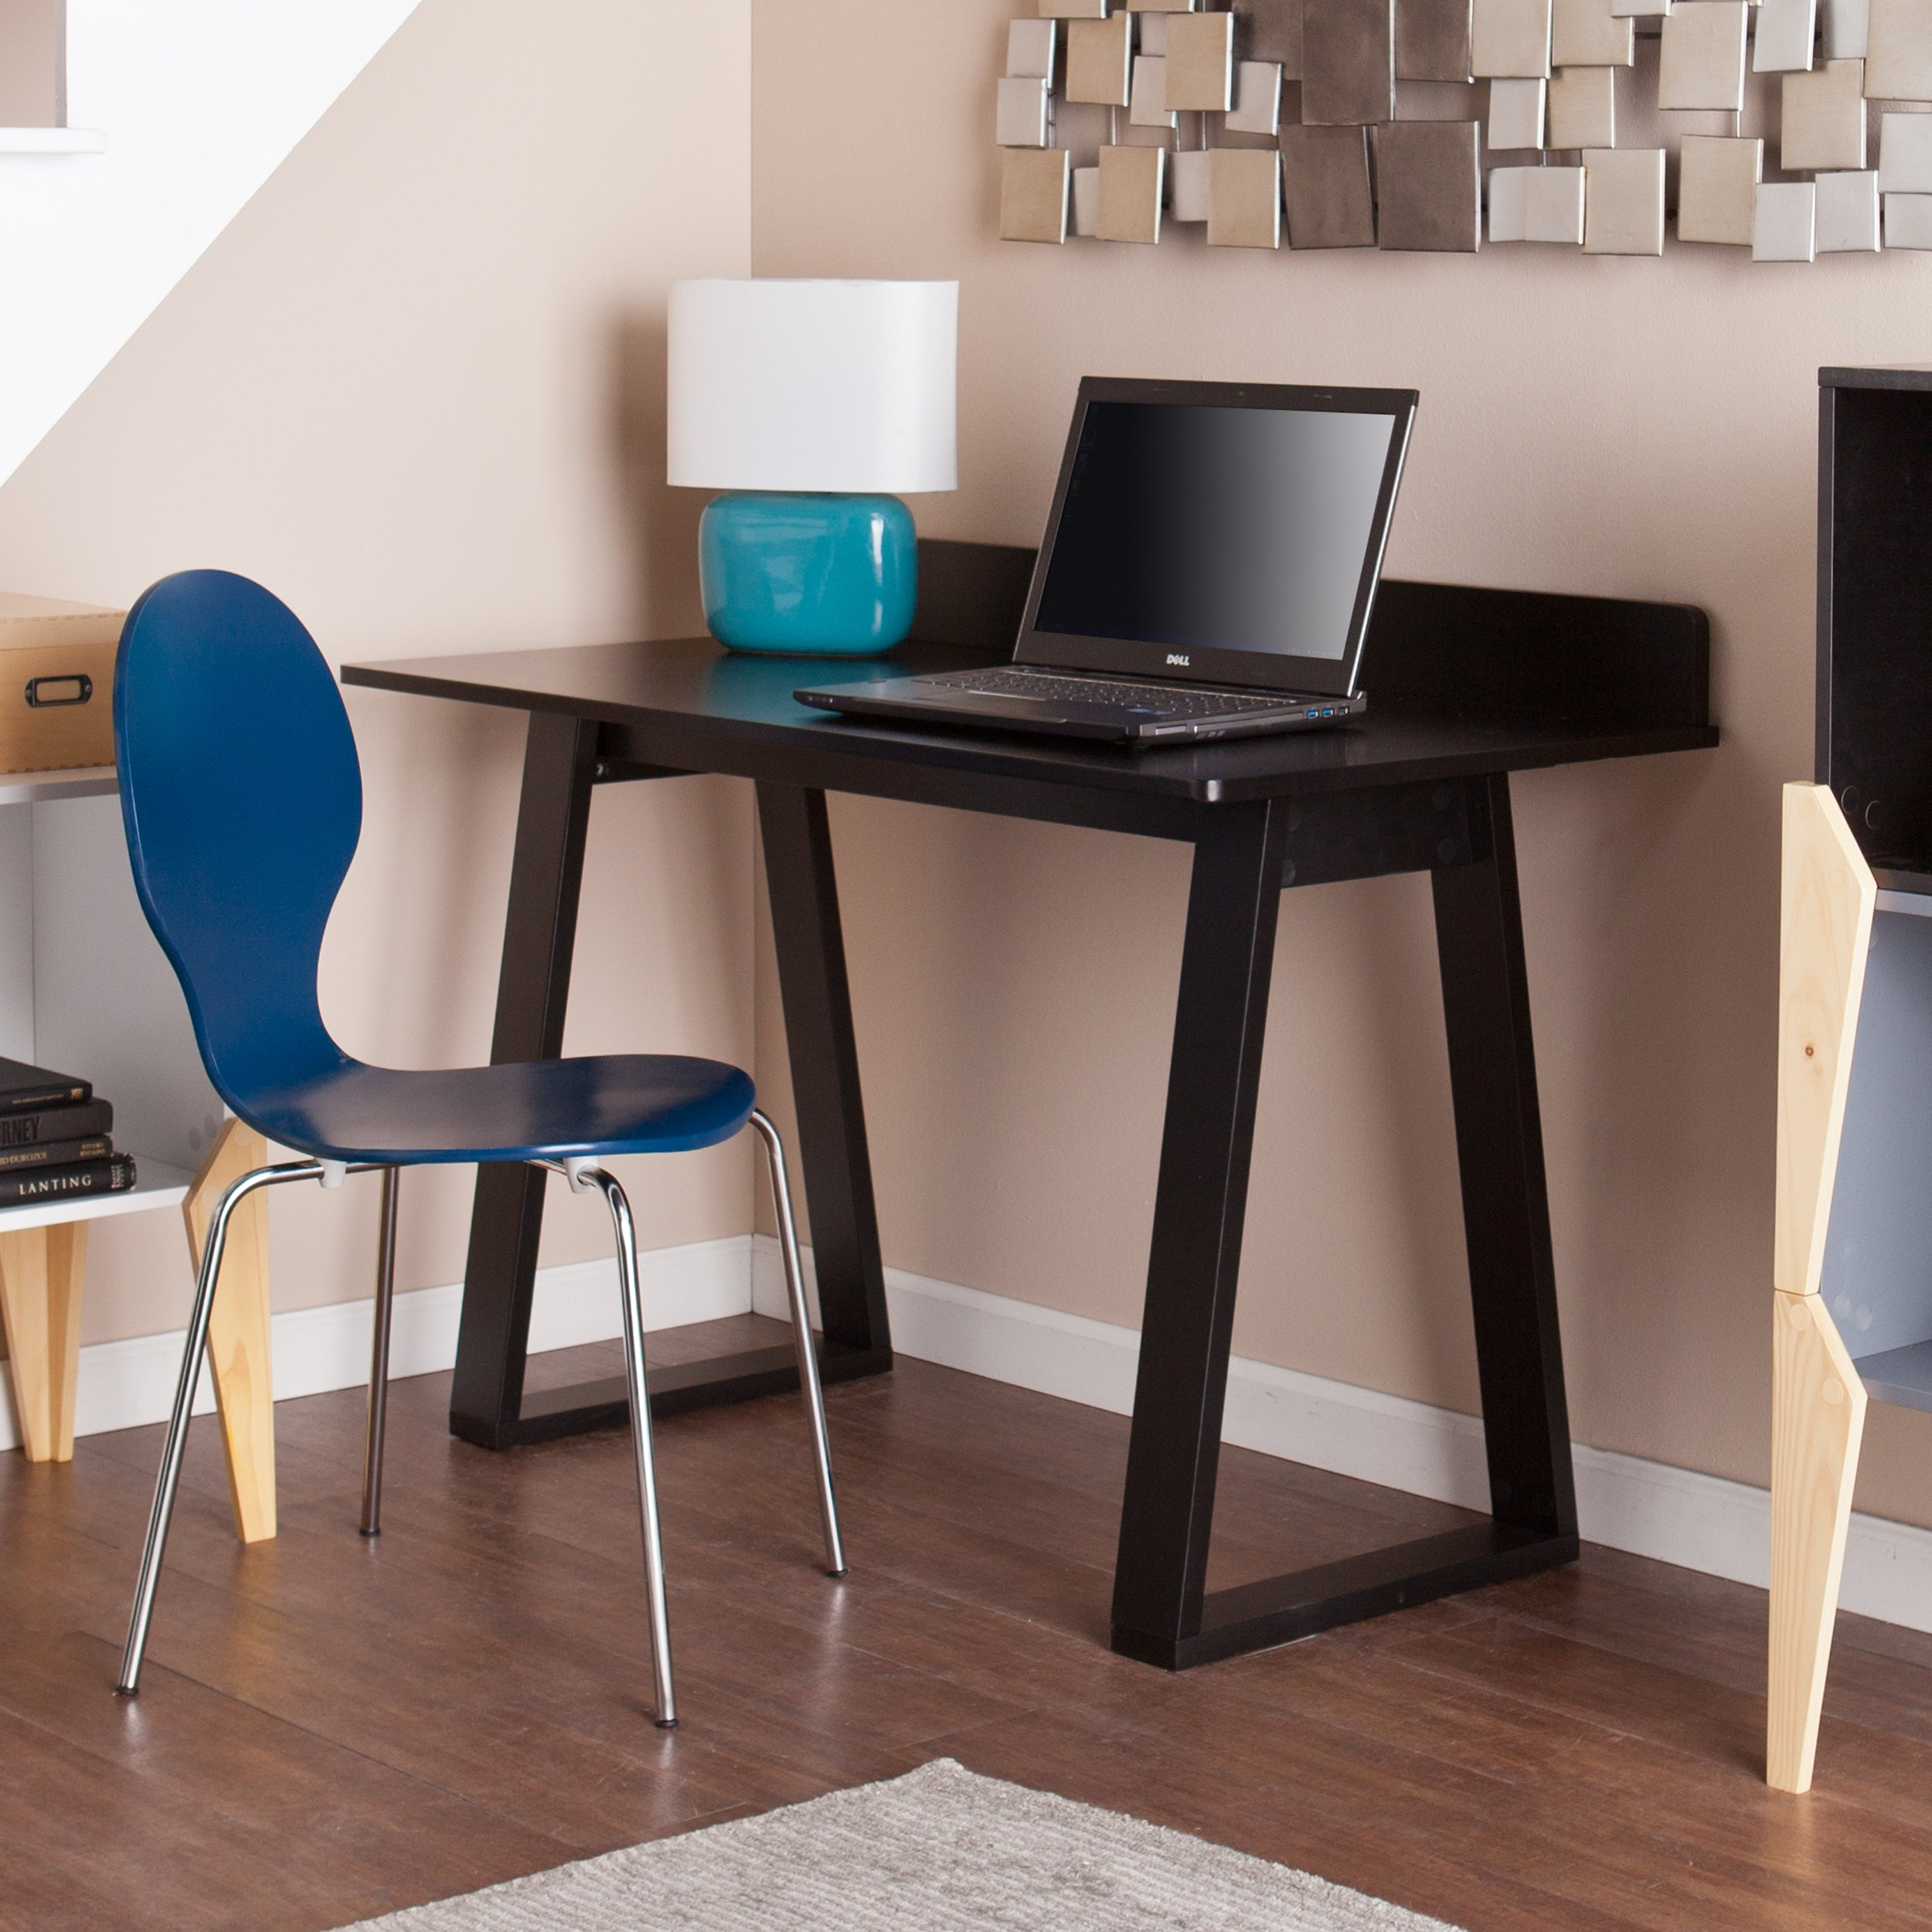 Holly & Martin Hagio Desk 48'' Wide, Crisp Black Finish by Holly & Martin